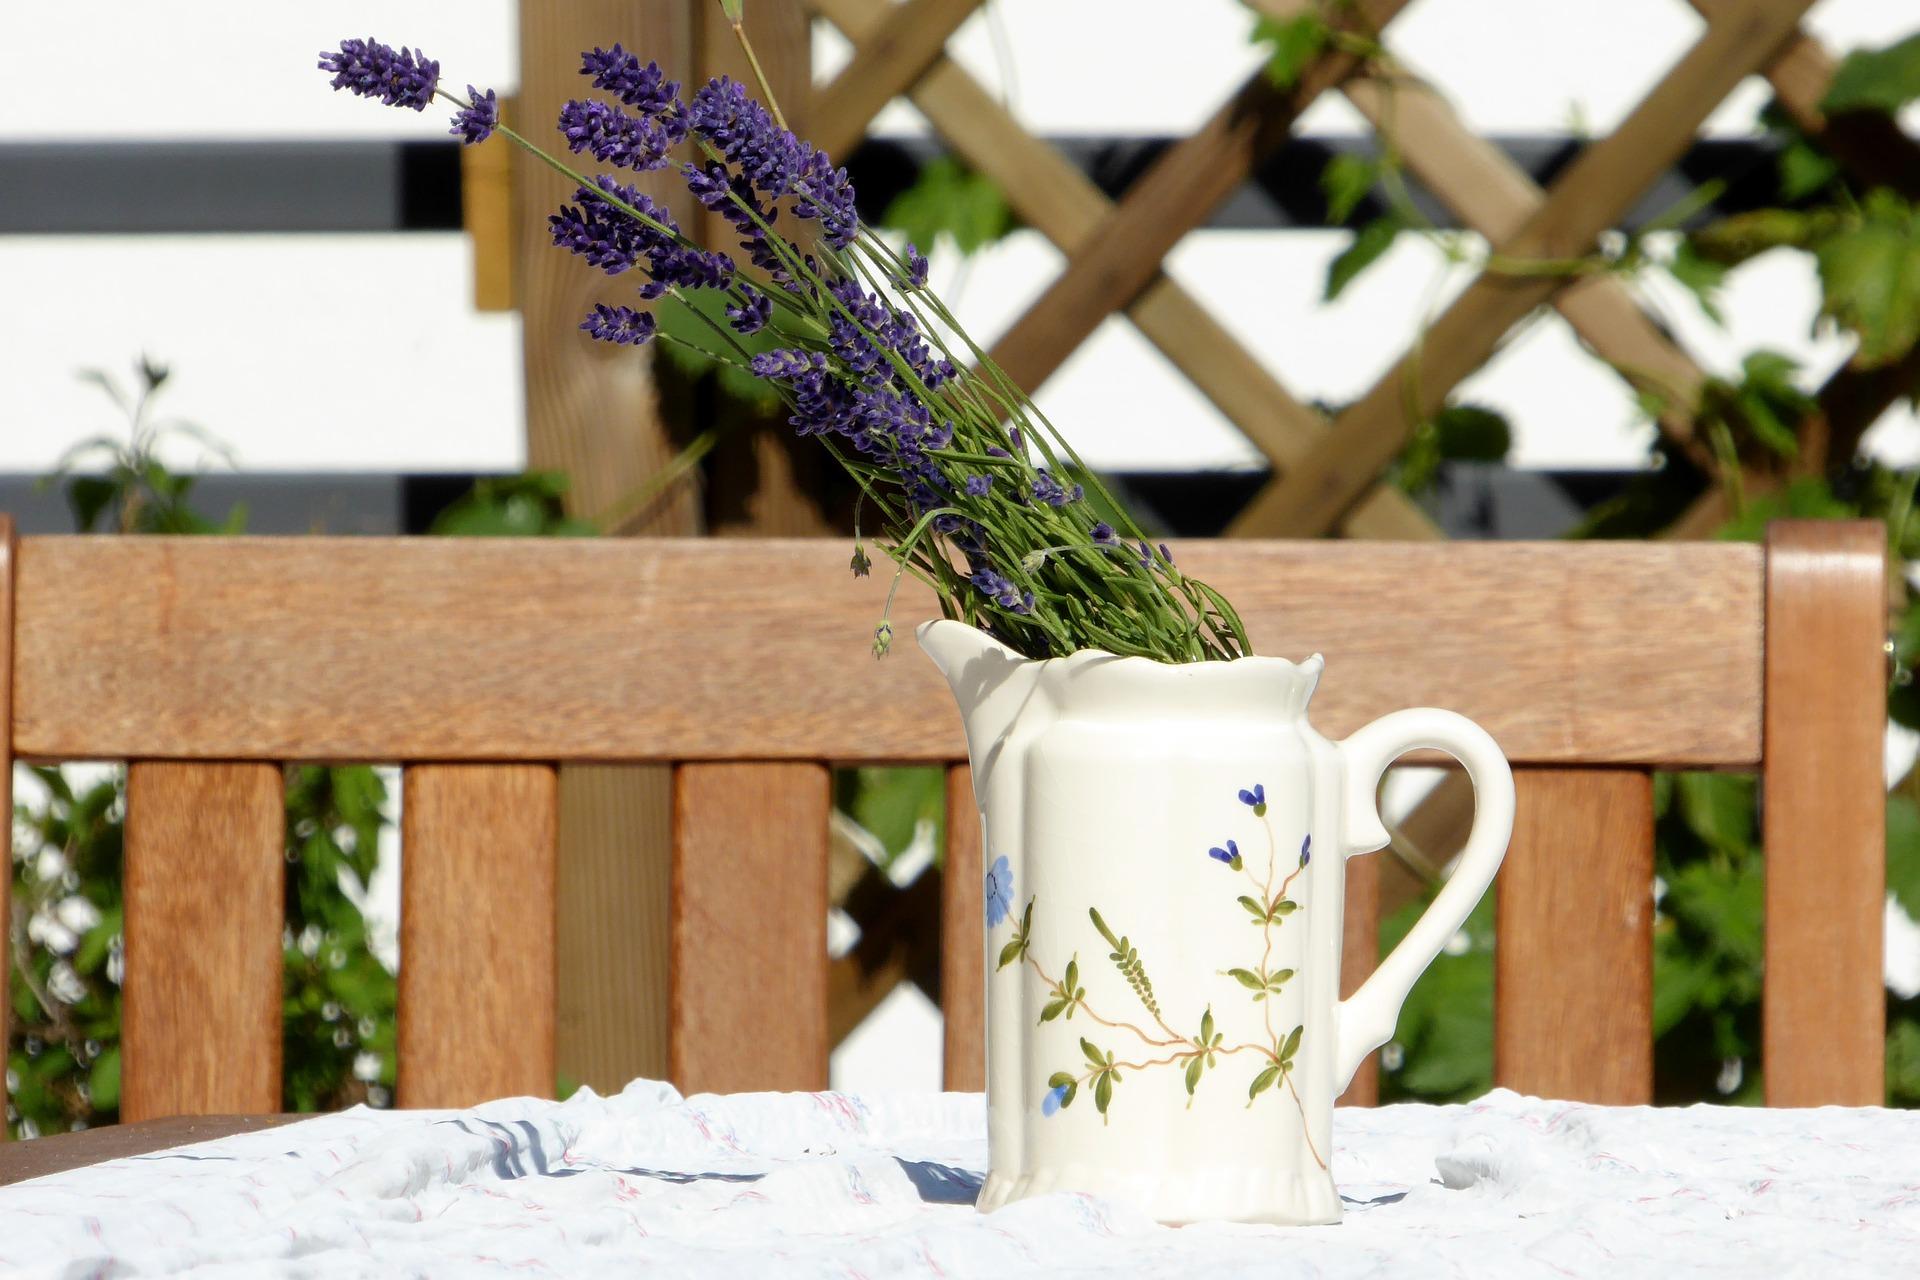 lavender-827463_1920